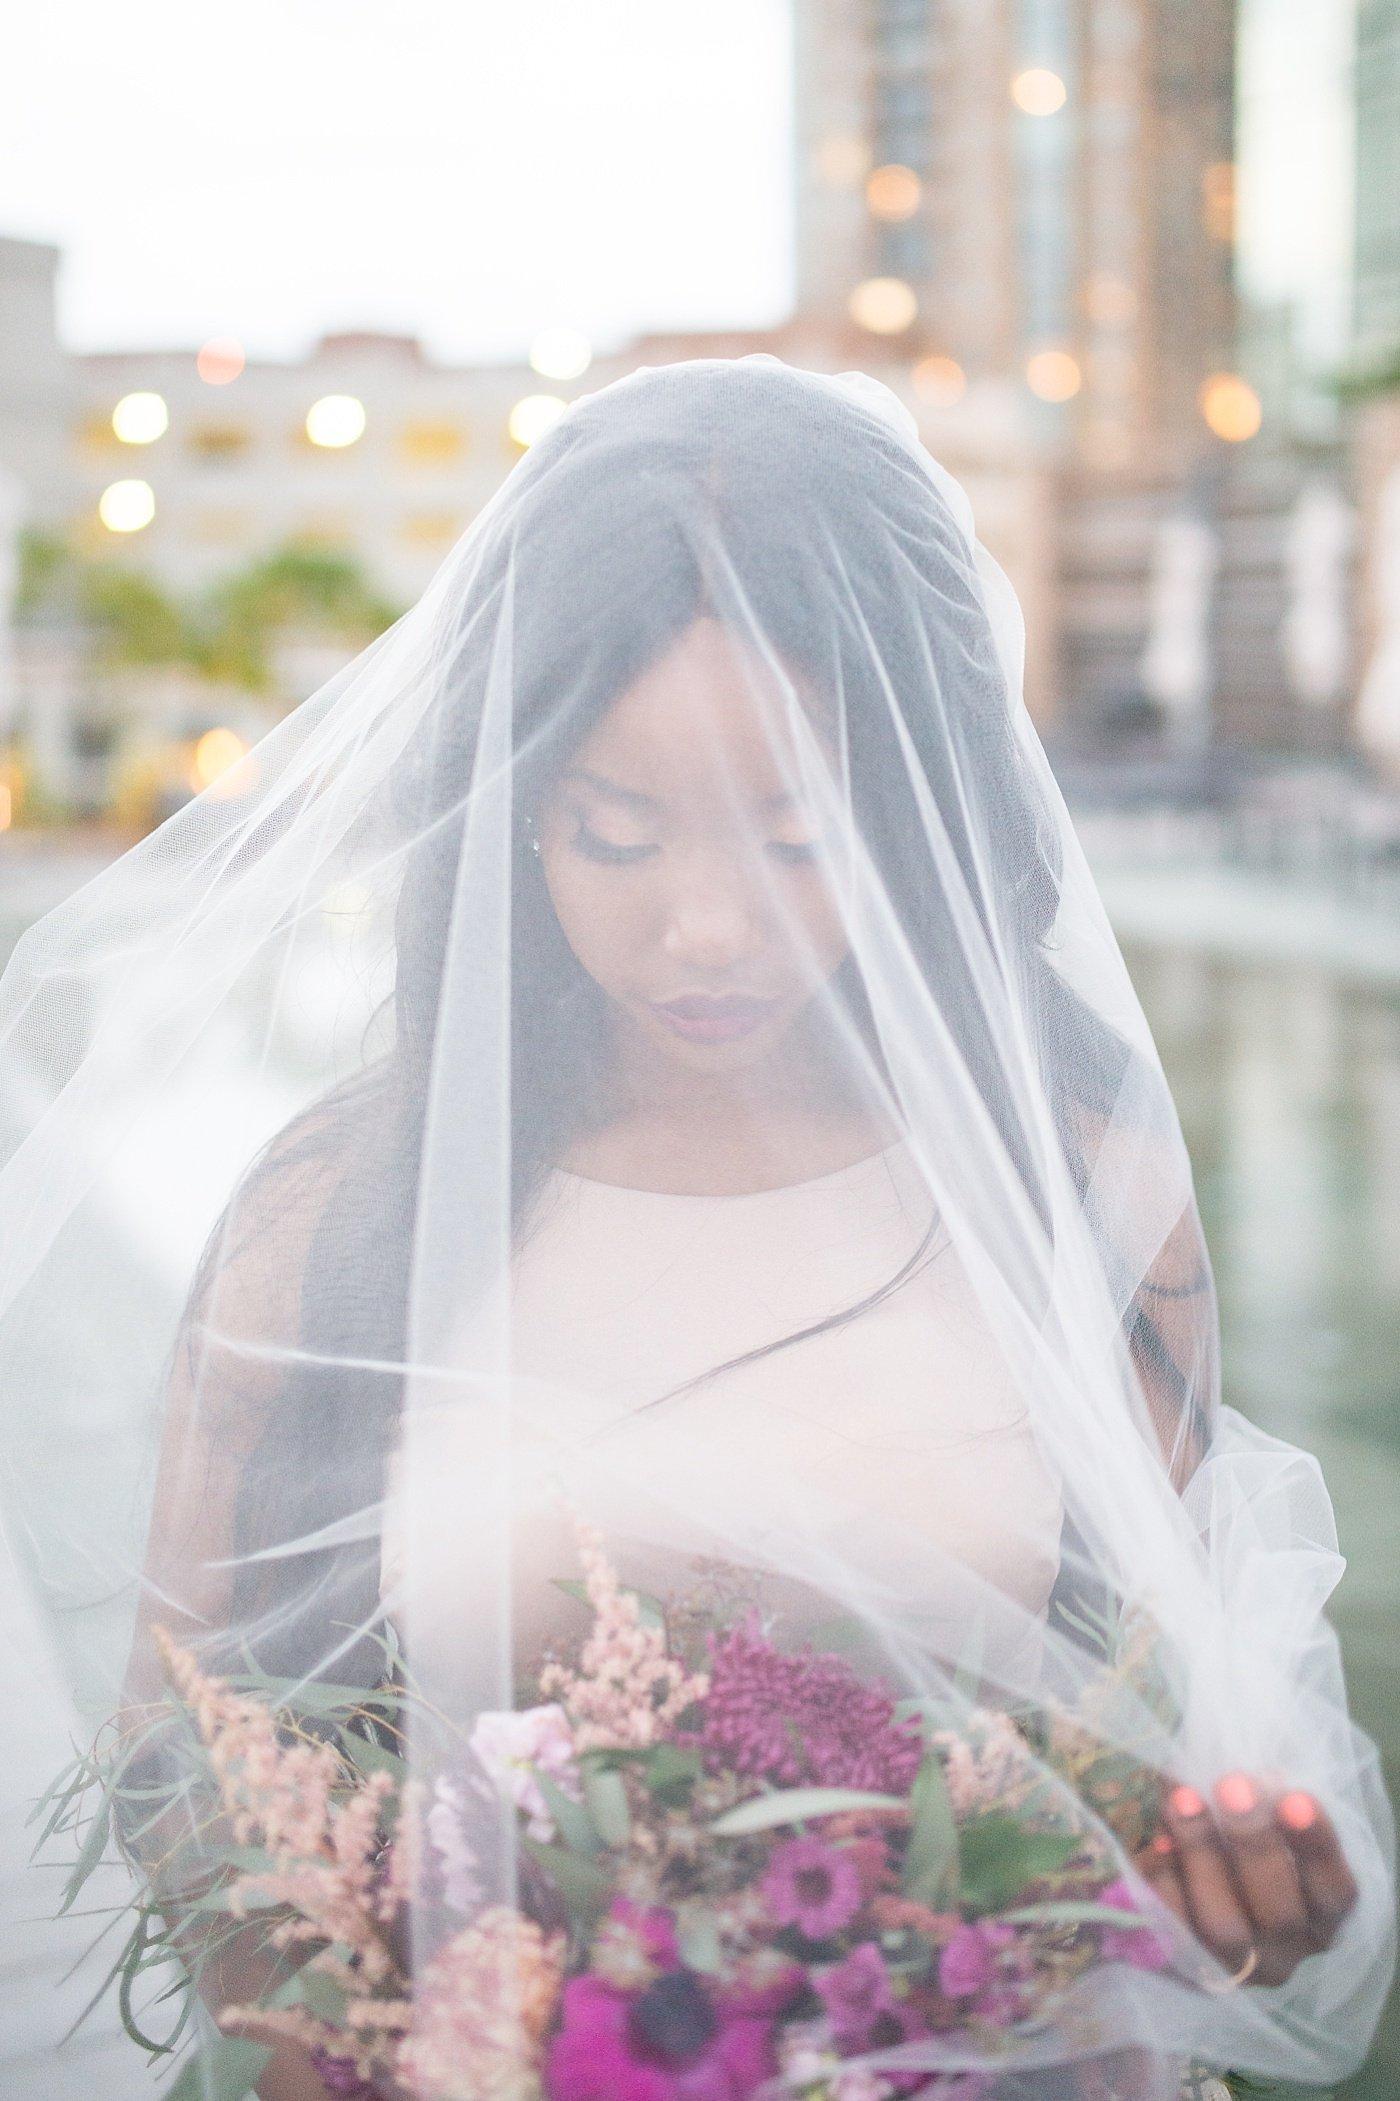 jewel-toned-wedding-inspiration-by-anna-mateo-photography-5